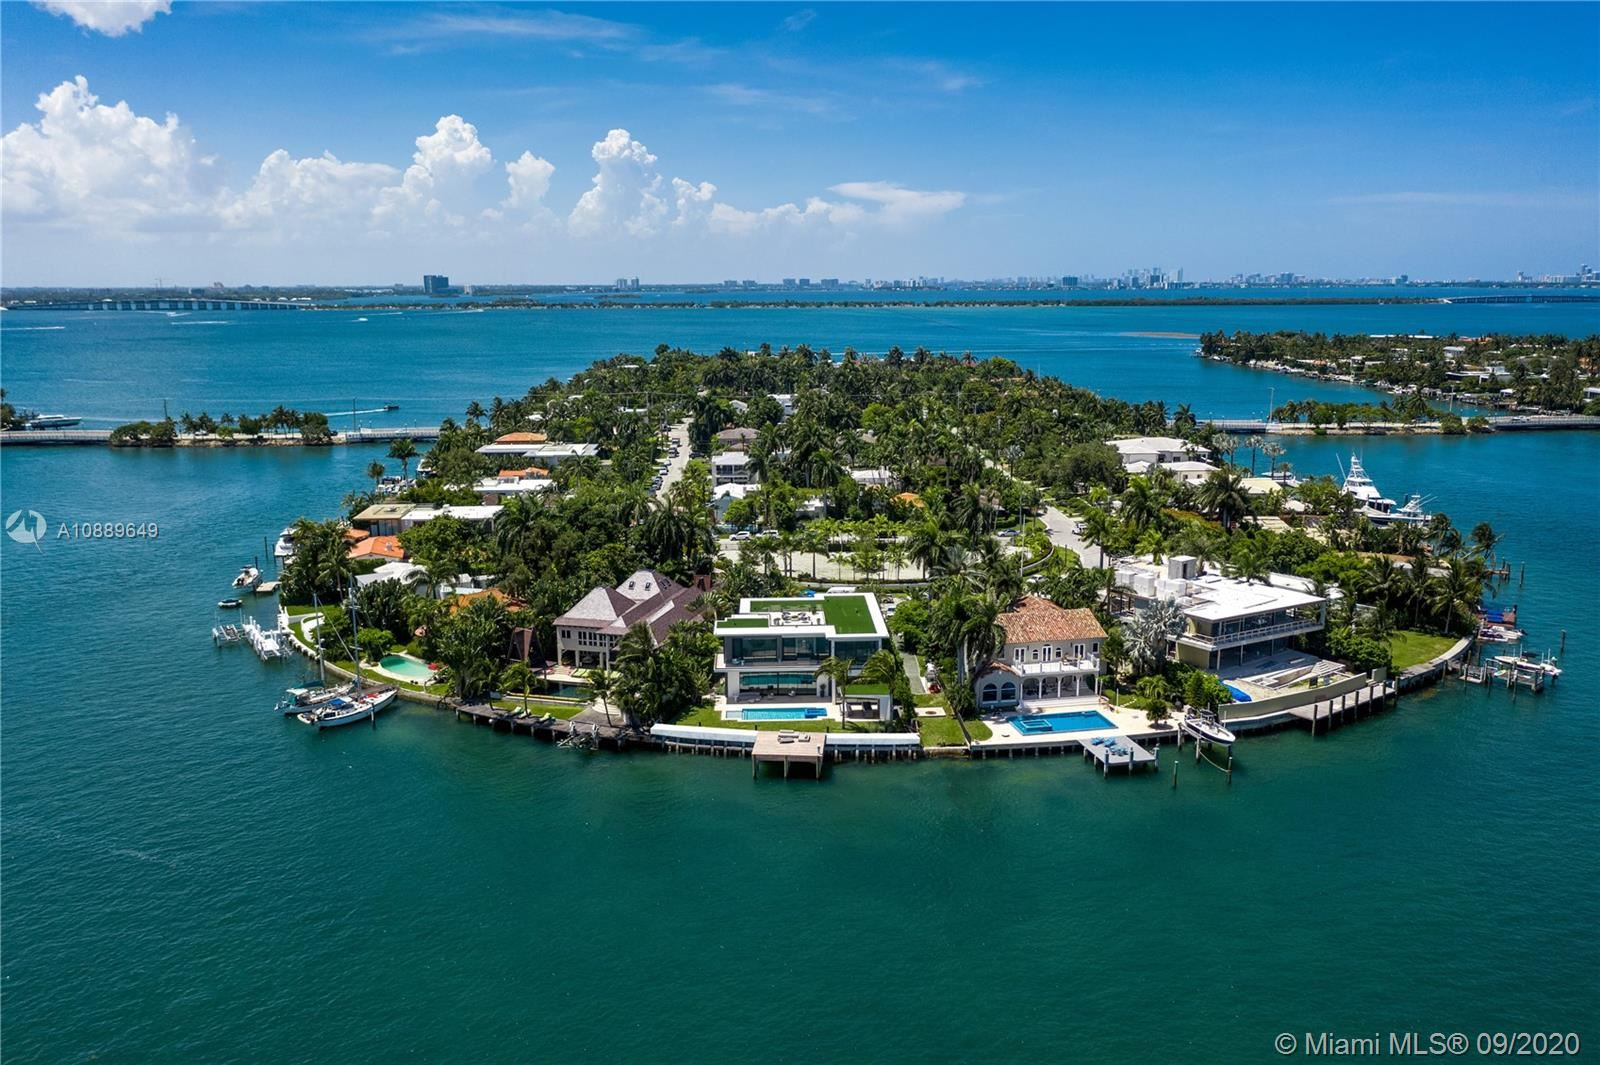 Photo 10 of Listing MLS a10889649 in 10 W San Marino Dr Miami Beach FL 33139